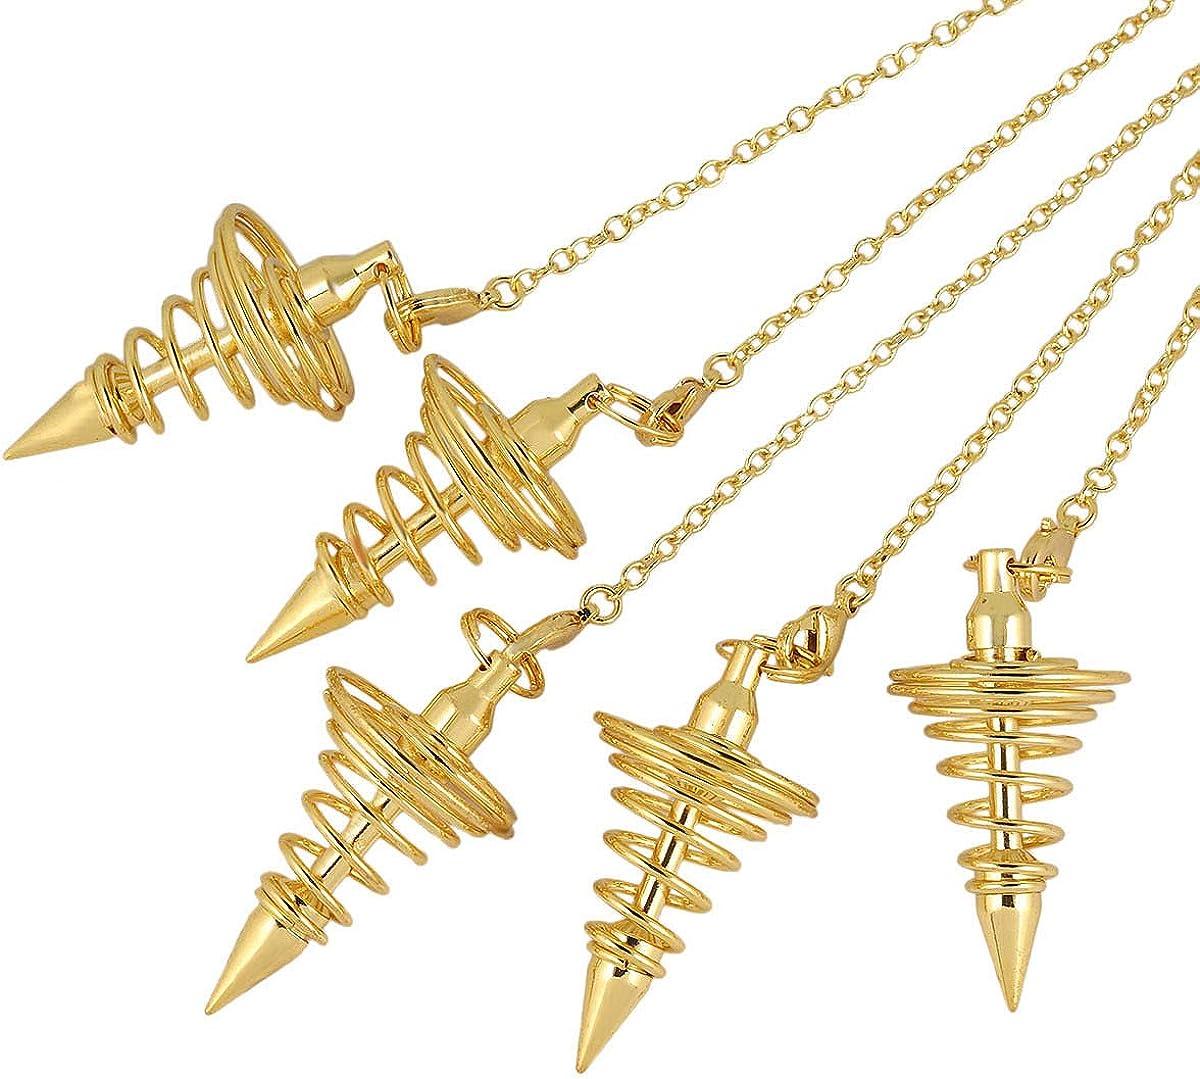 TUMBEELLUWA 2 Spiral Metal Pendant Pendulum for Divination Dowsing Healing Reiki Meditation Tool